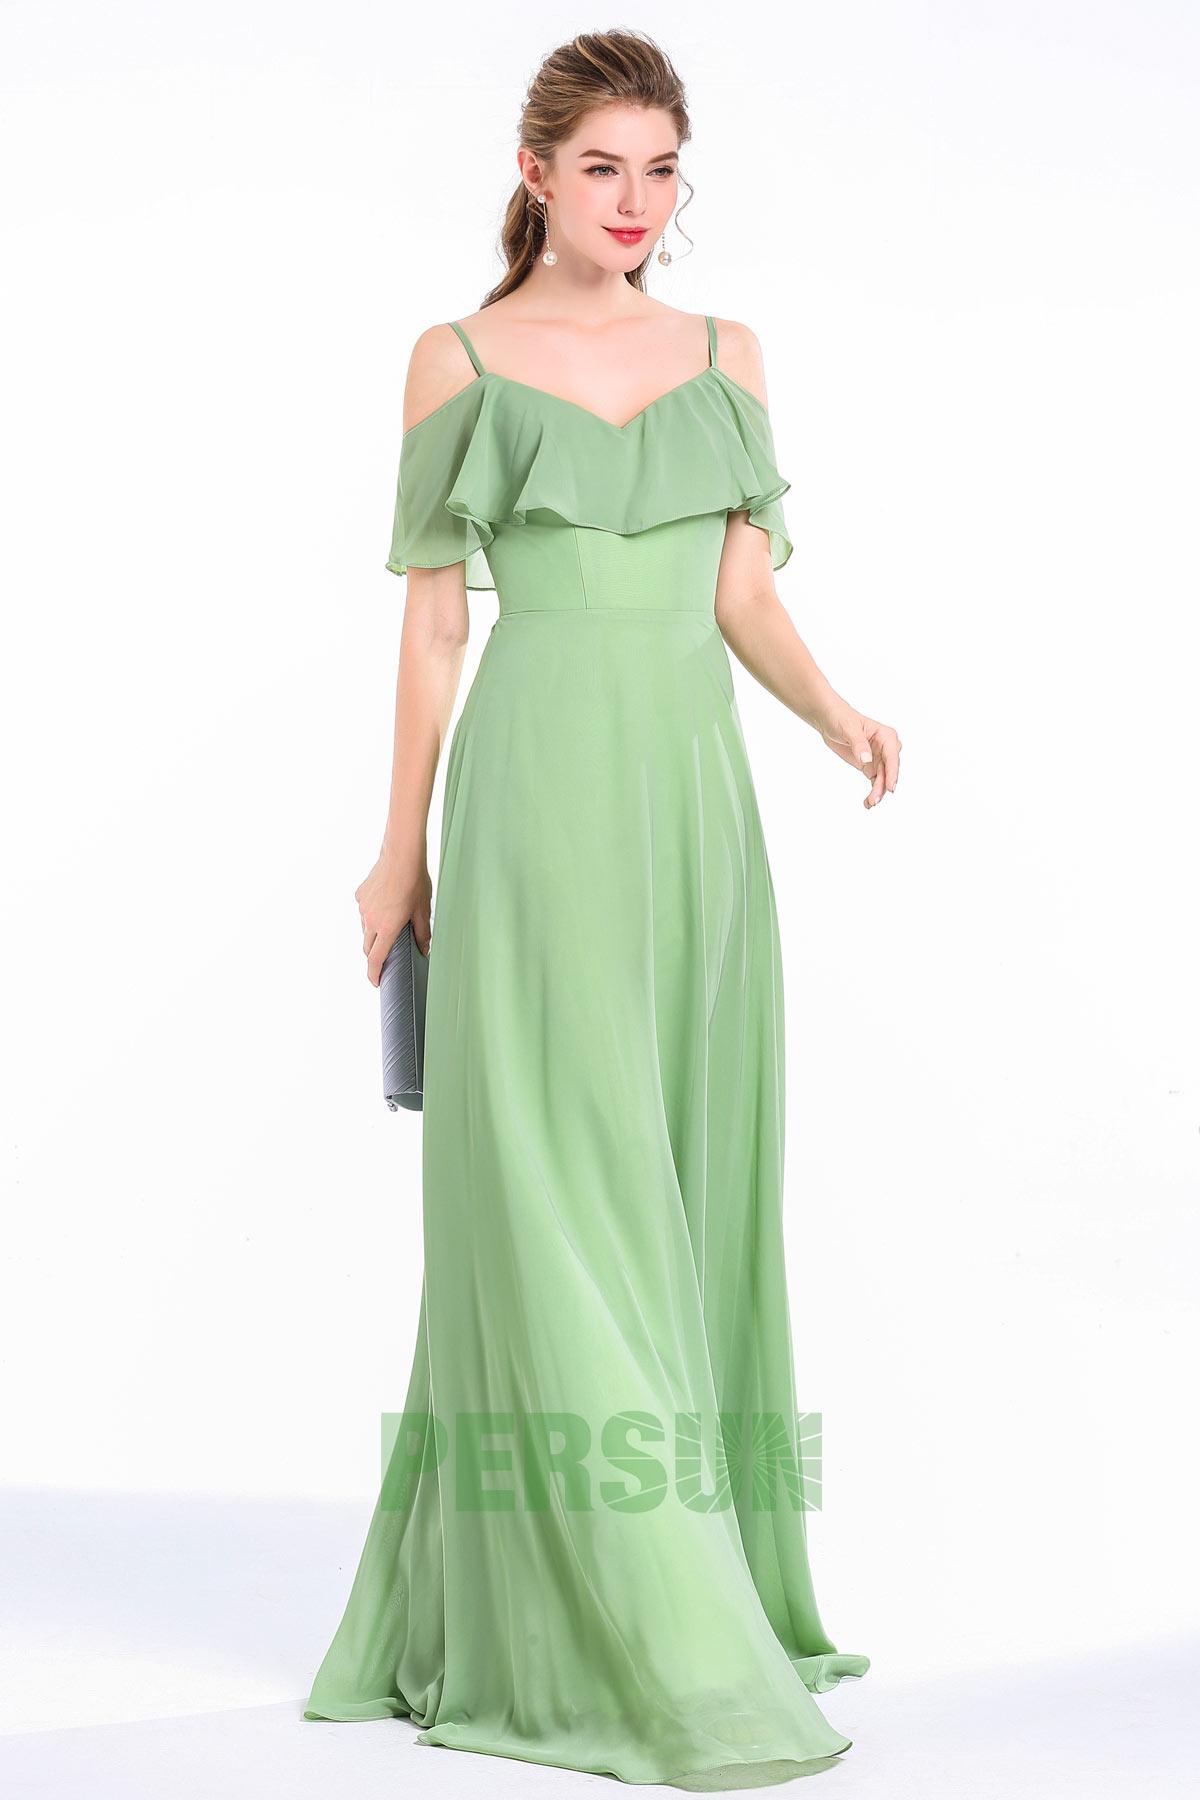 robe demoiselle d'honneur verte mousseline longue avec bretelle